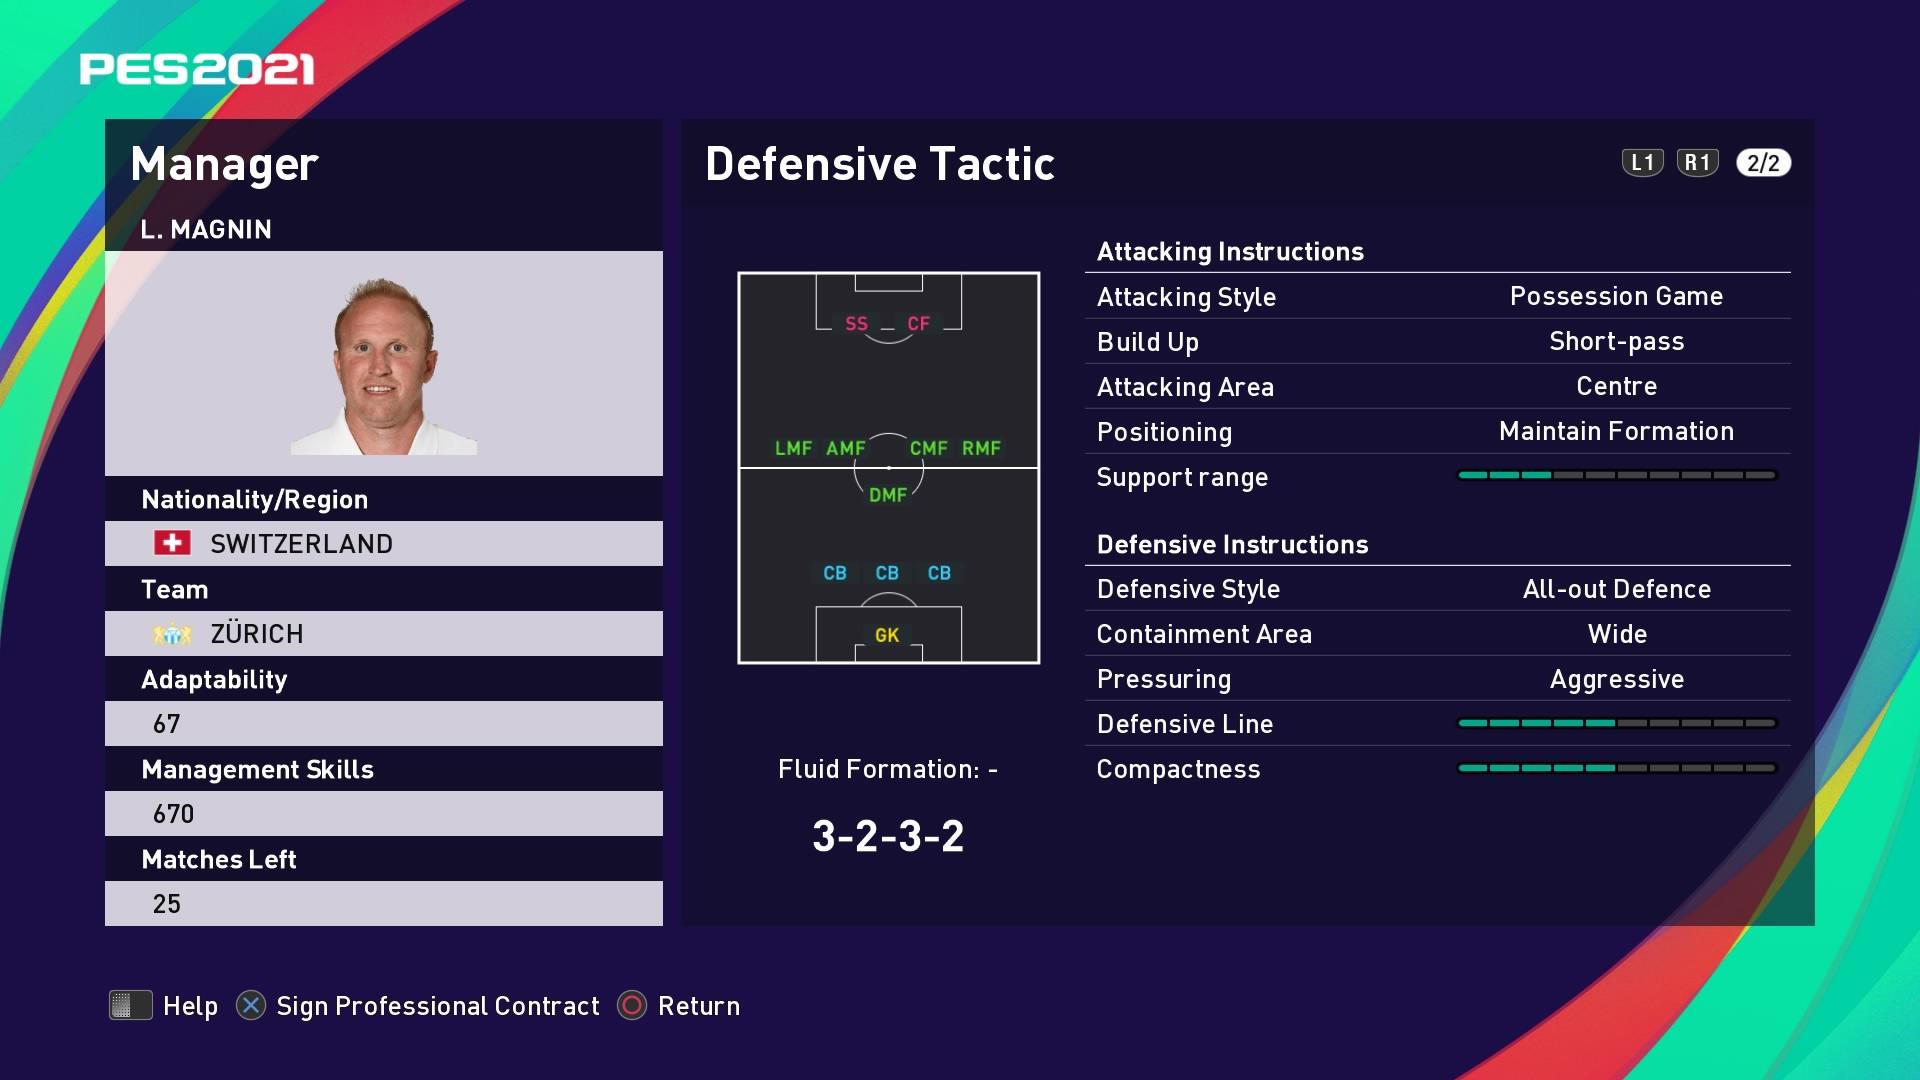 L. Magnin (Ludovic Magnin) Defensive Tactic in PES 2021 myClub